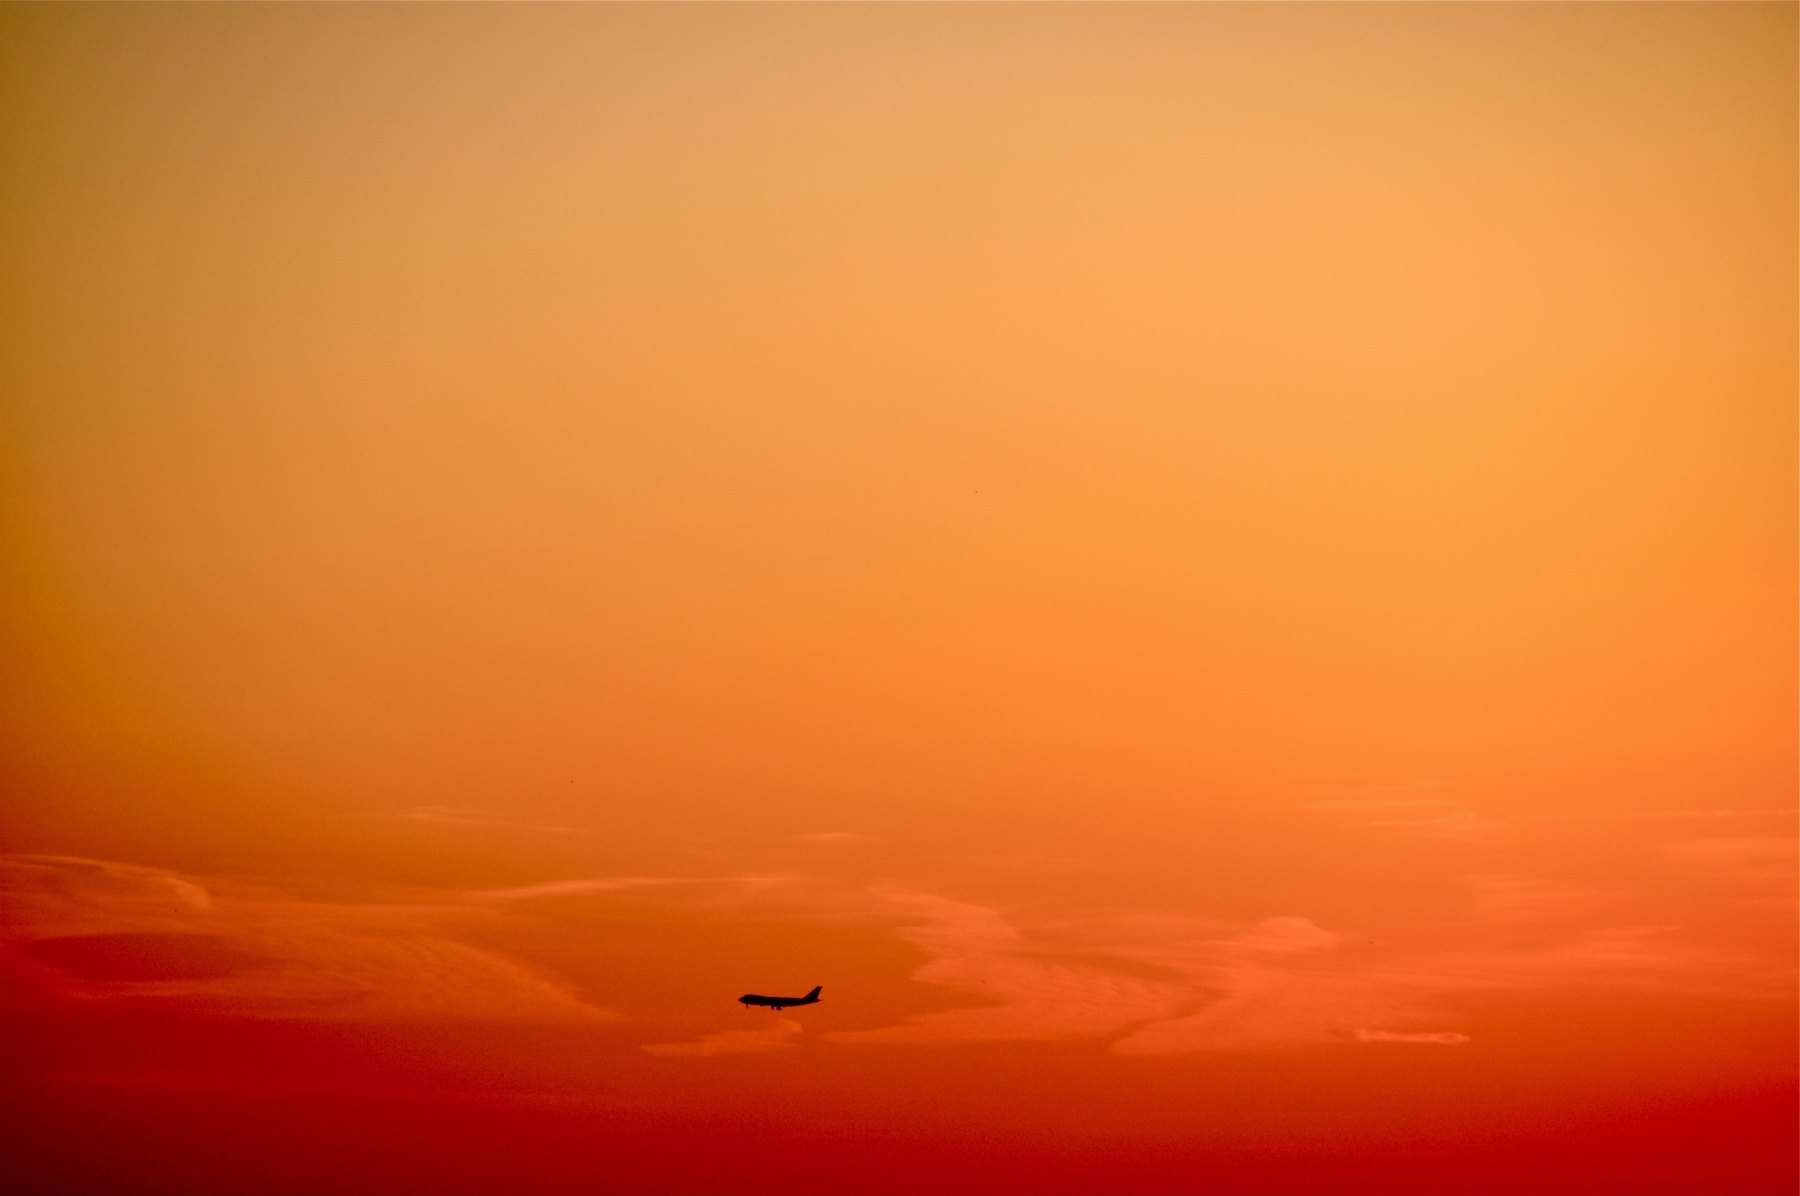 c82-Plane1meg